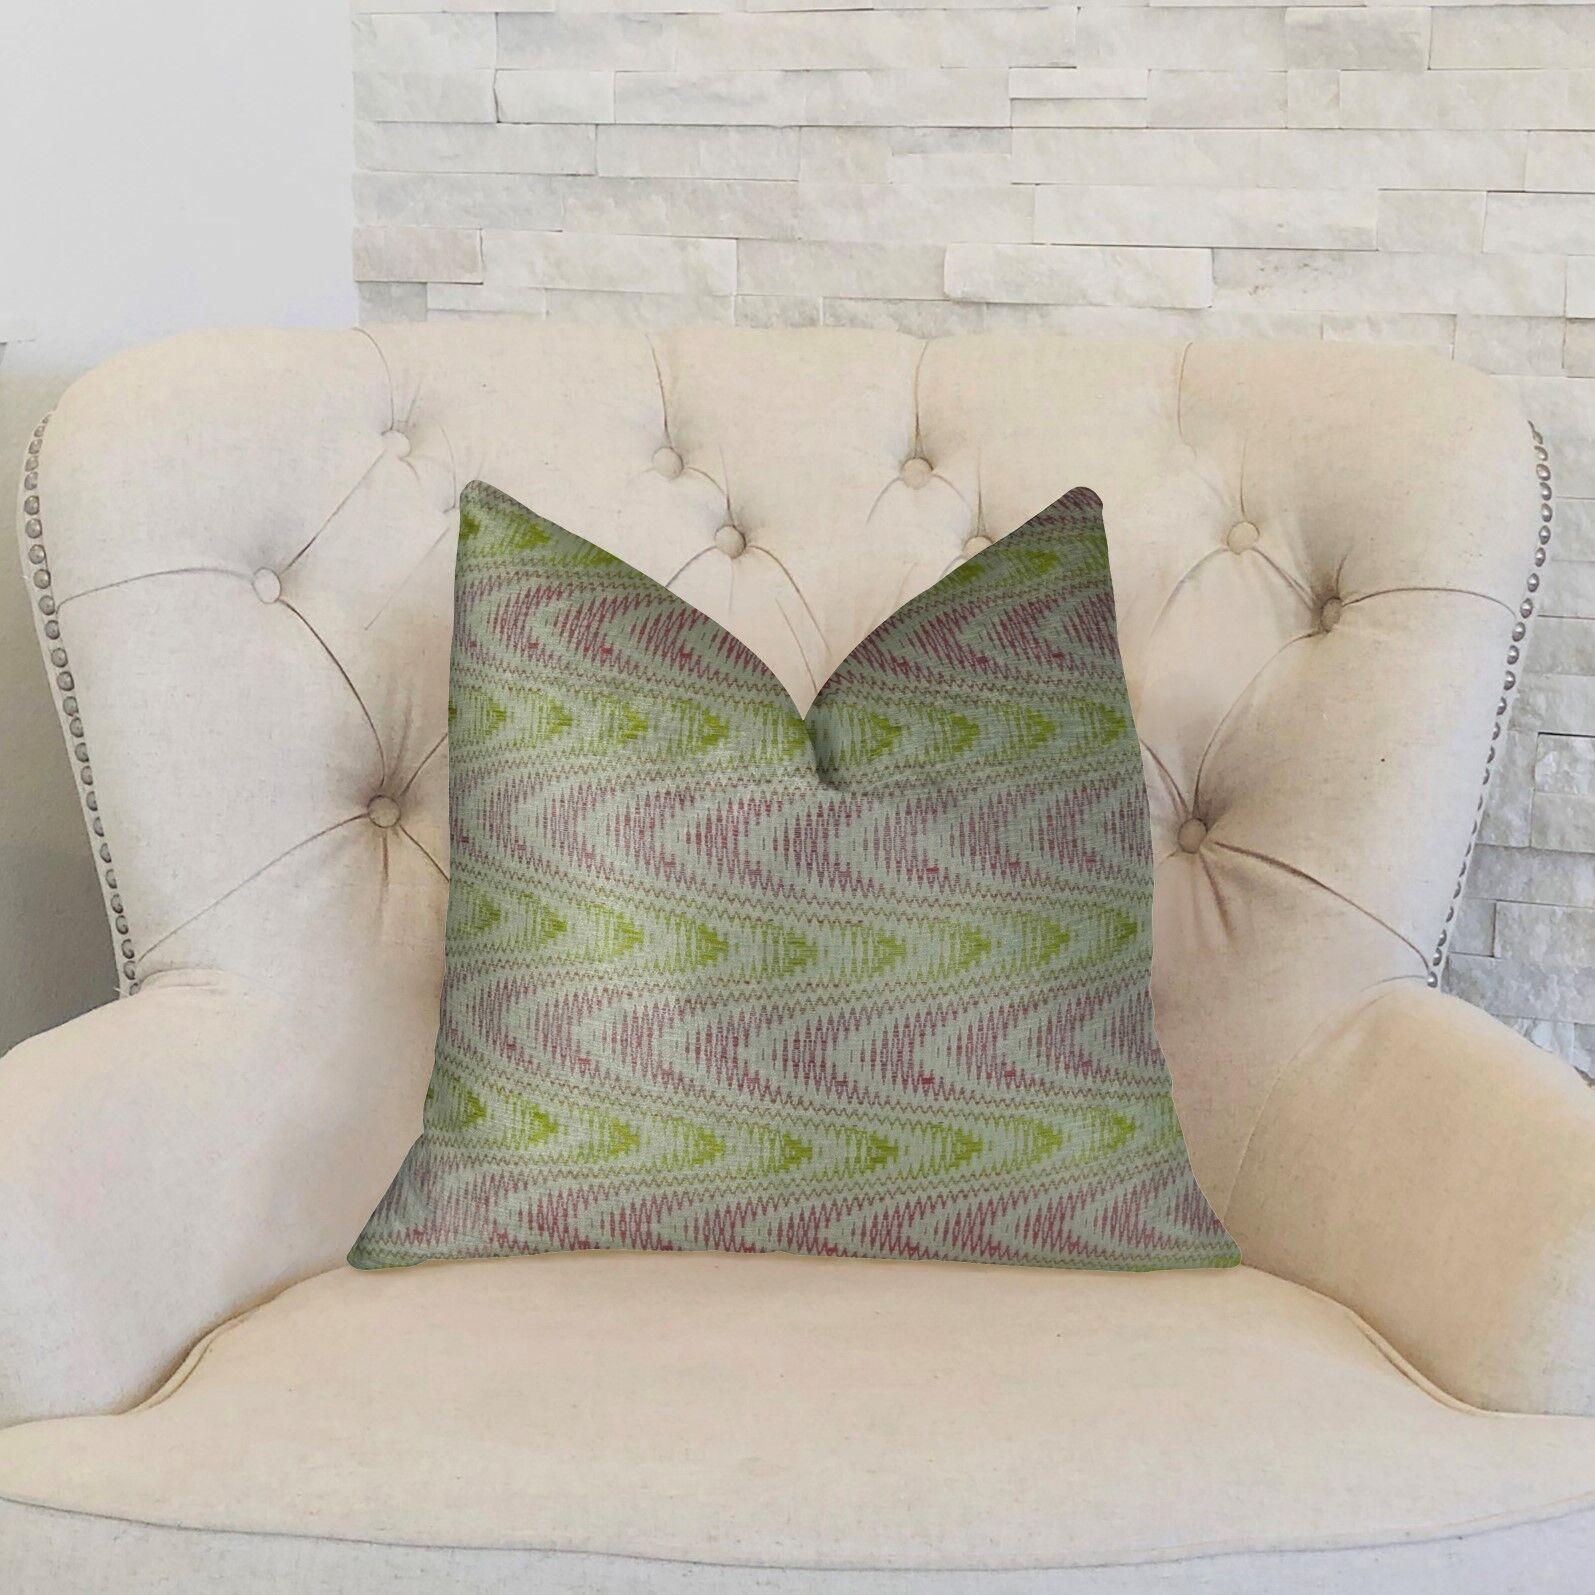 Jara-Scairffia Handmade Luxury Pillow Size: 20